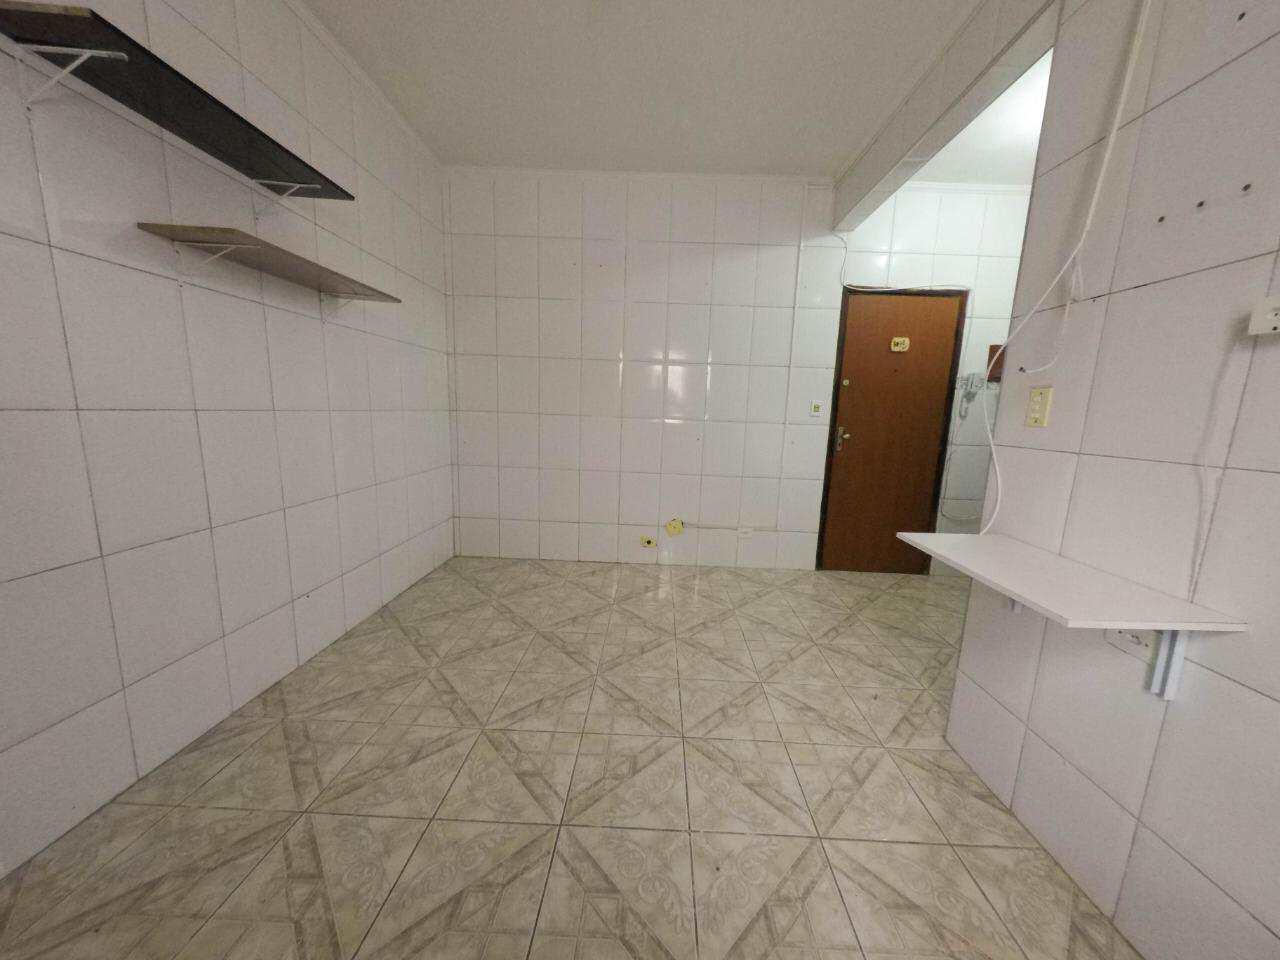 Kitnet com 1 dorm, Ocian, Praia Grande - R$ 75 mil, Cod: 5377